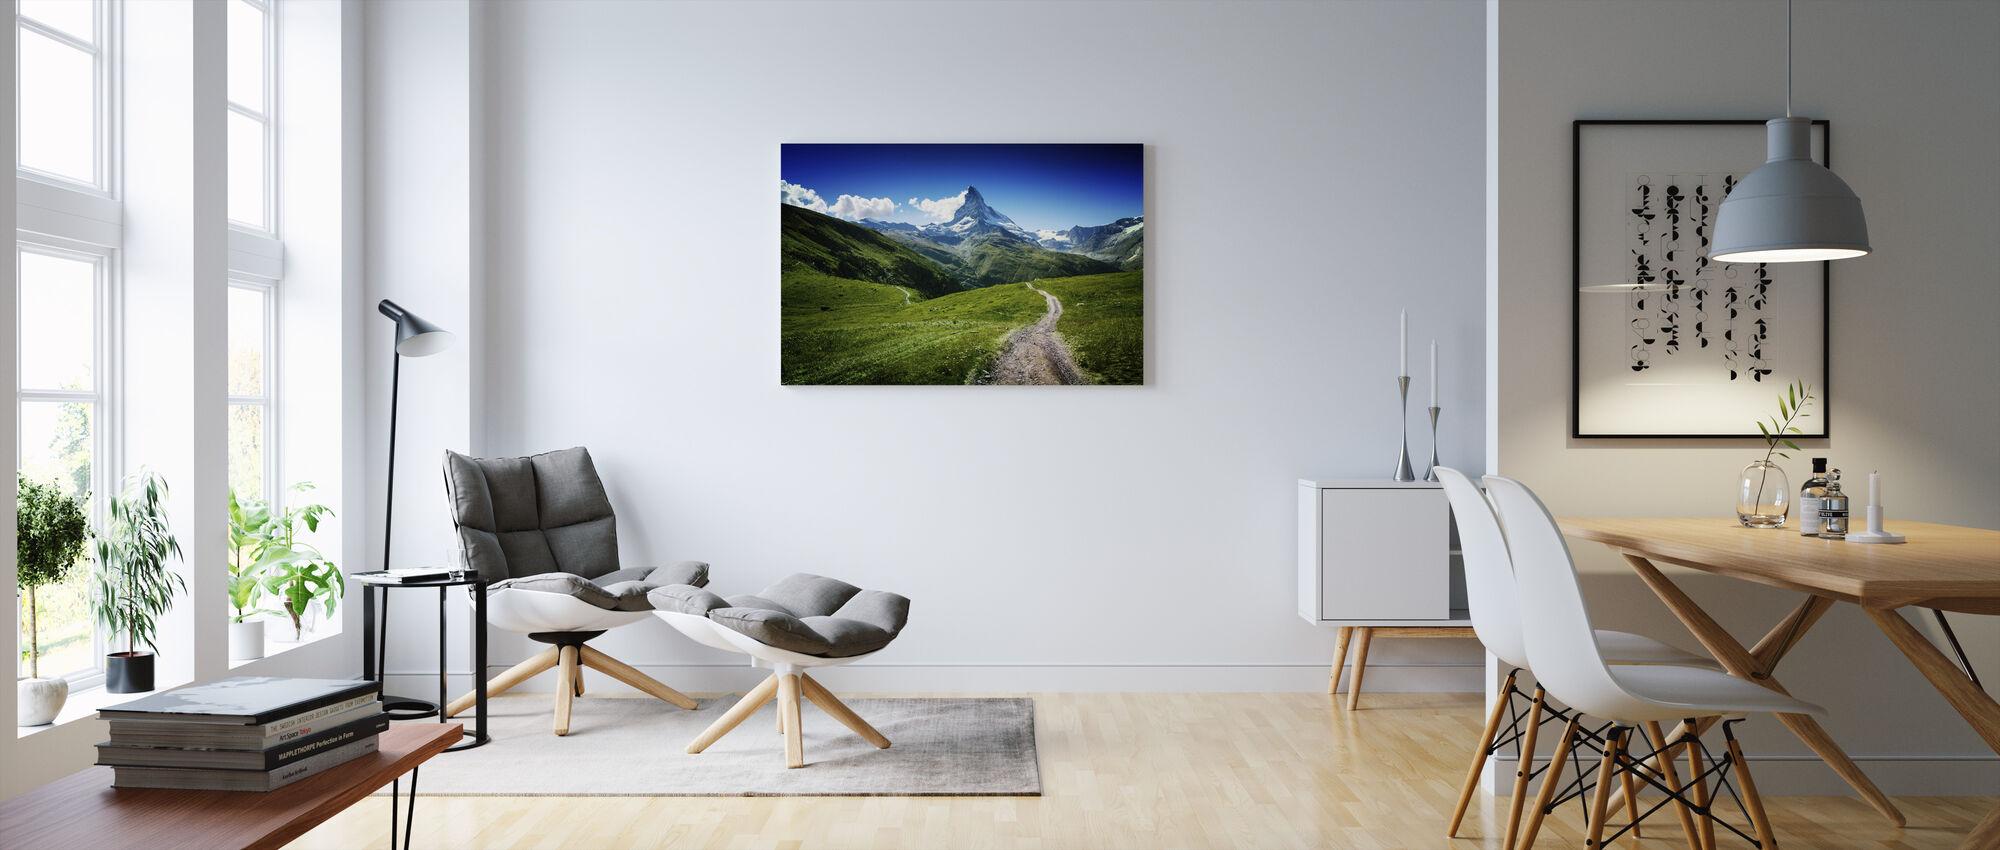 Matterhorn II - Canvastaulu - Olohuone